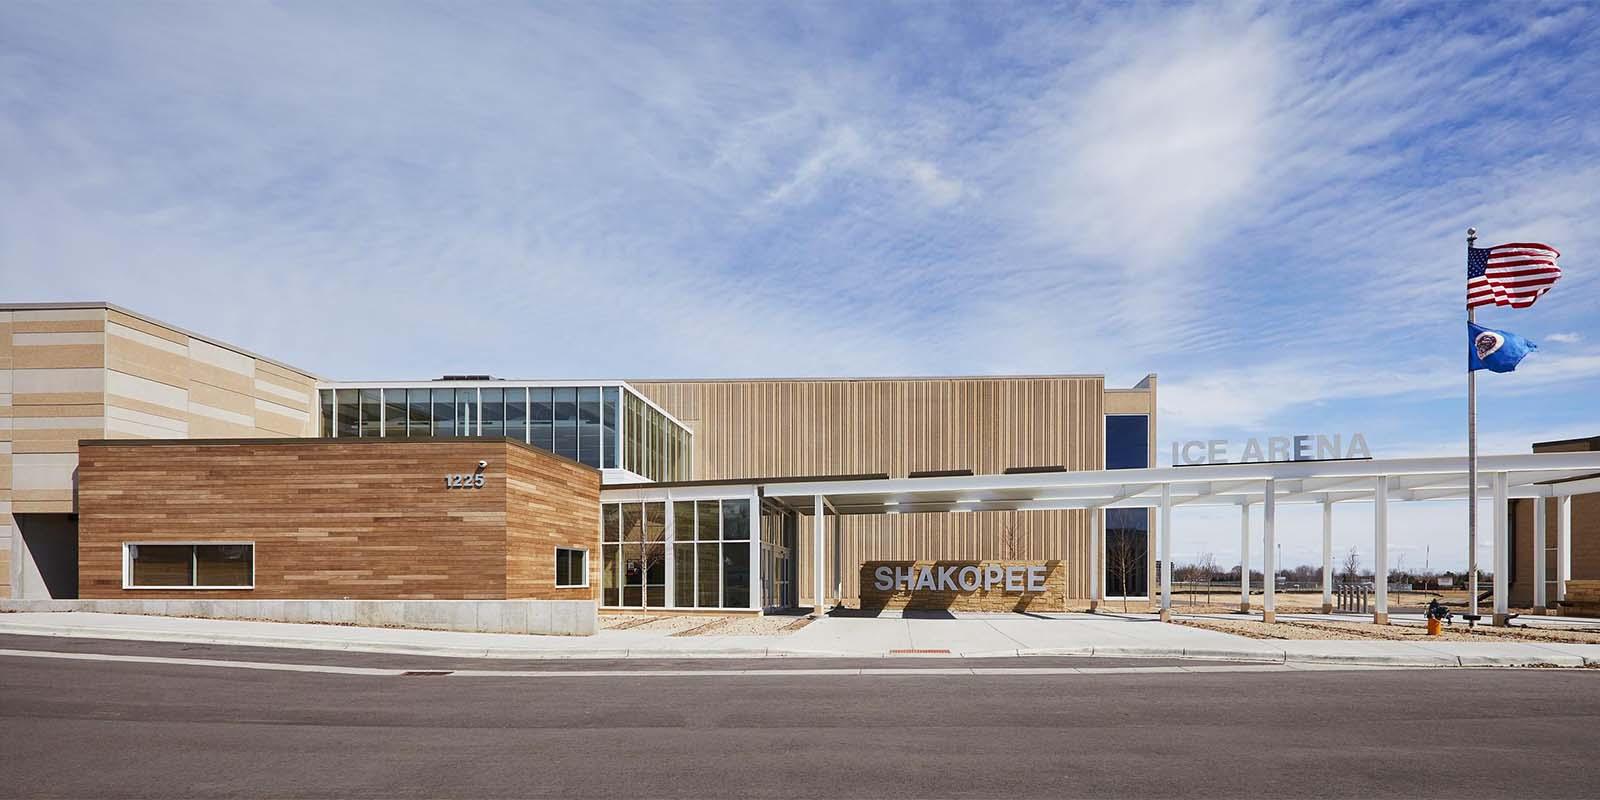 Shakopee community center and ice arena photo 2